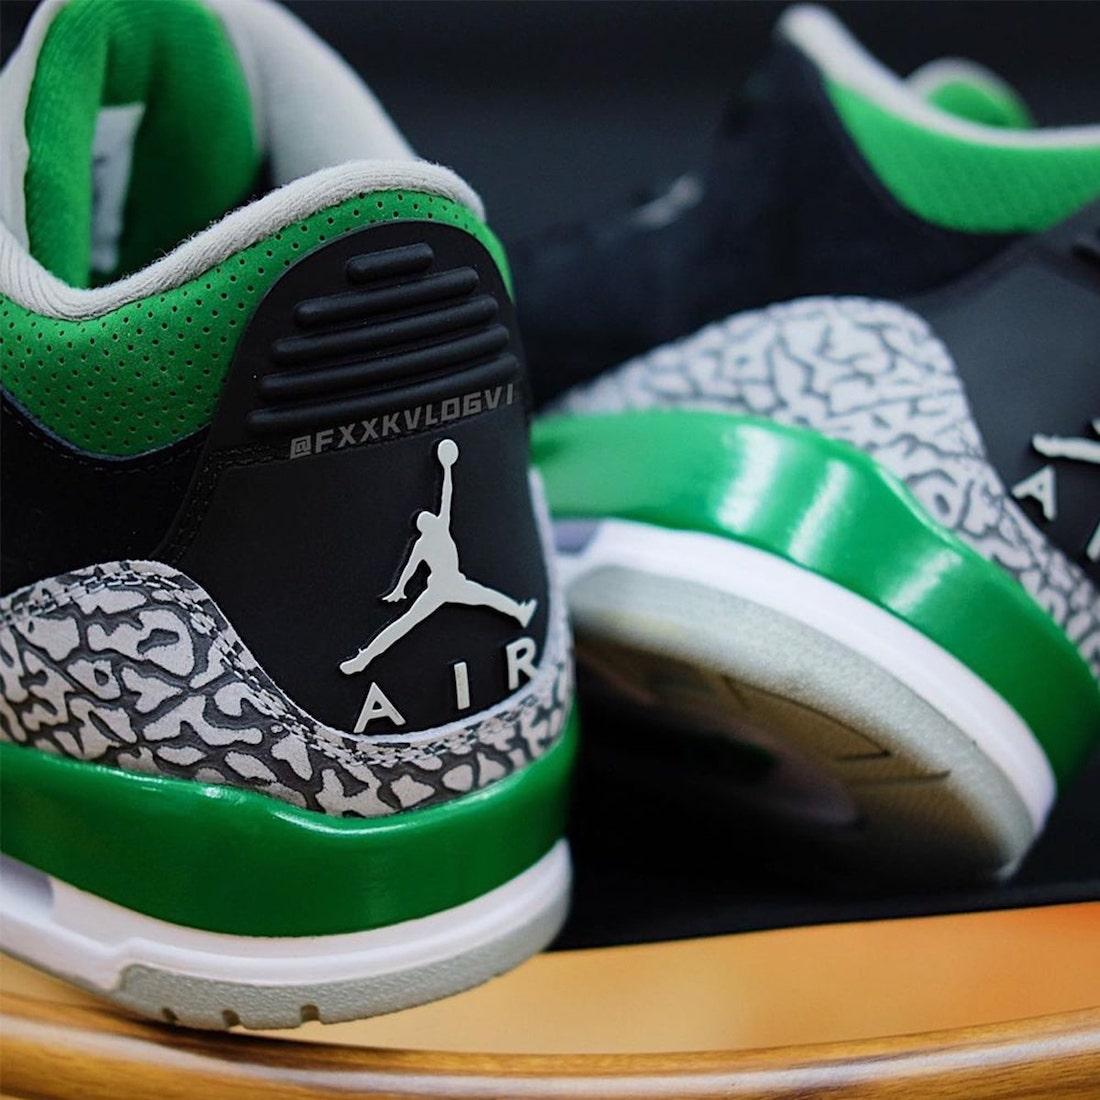 Air Jordan 3,Pine Green,CT8532  天价「俄勒冈」配色!全新 AJ3 上脚图曝光!